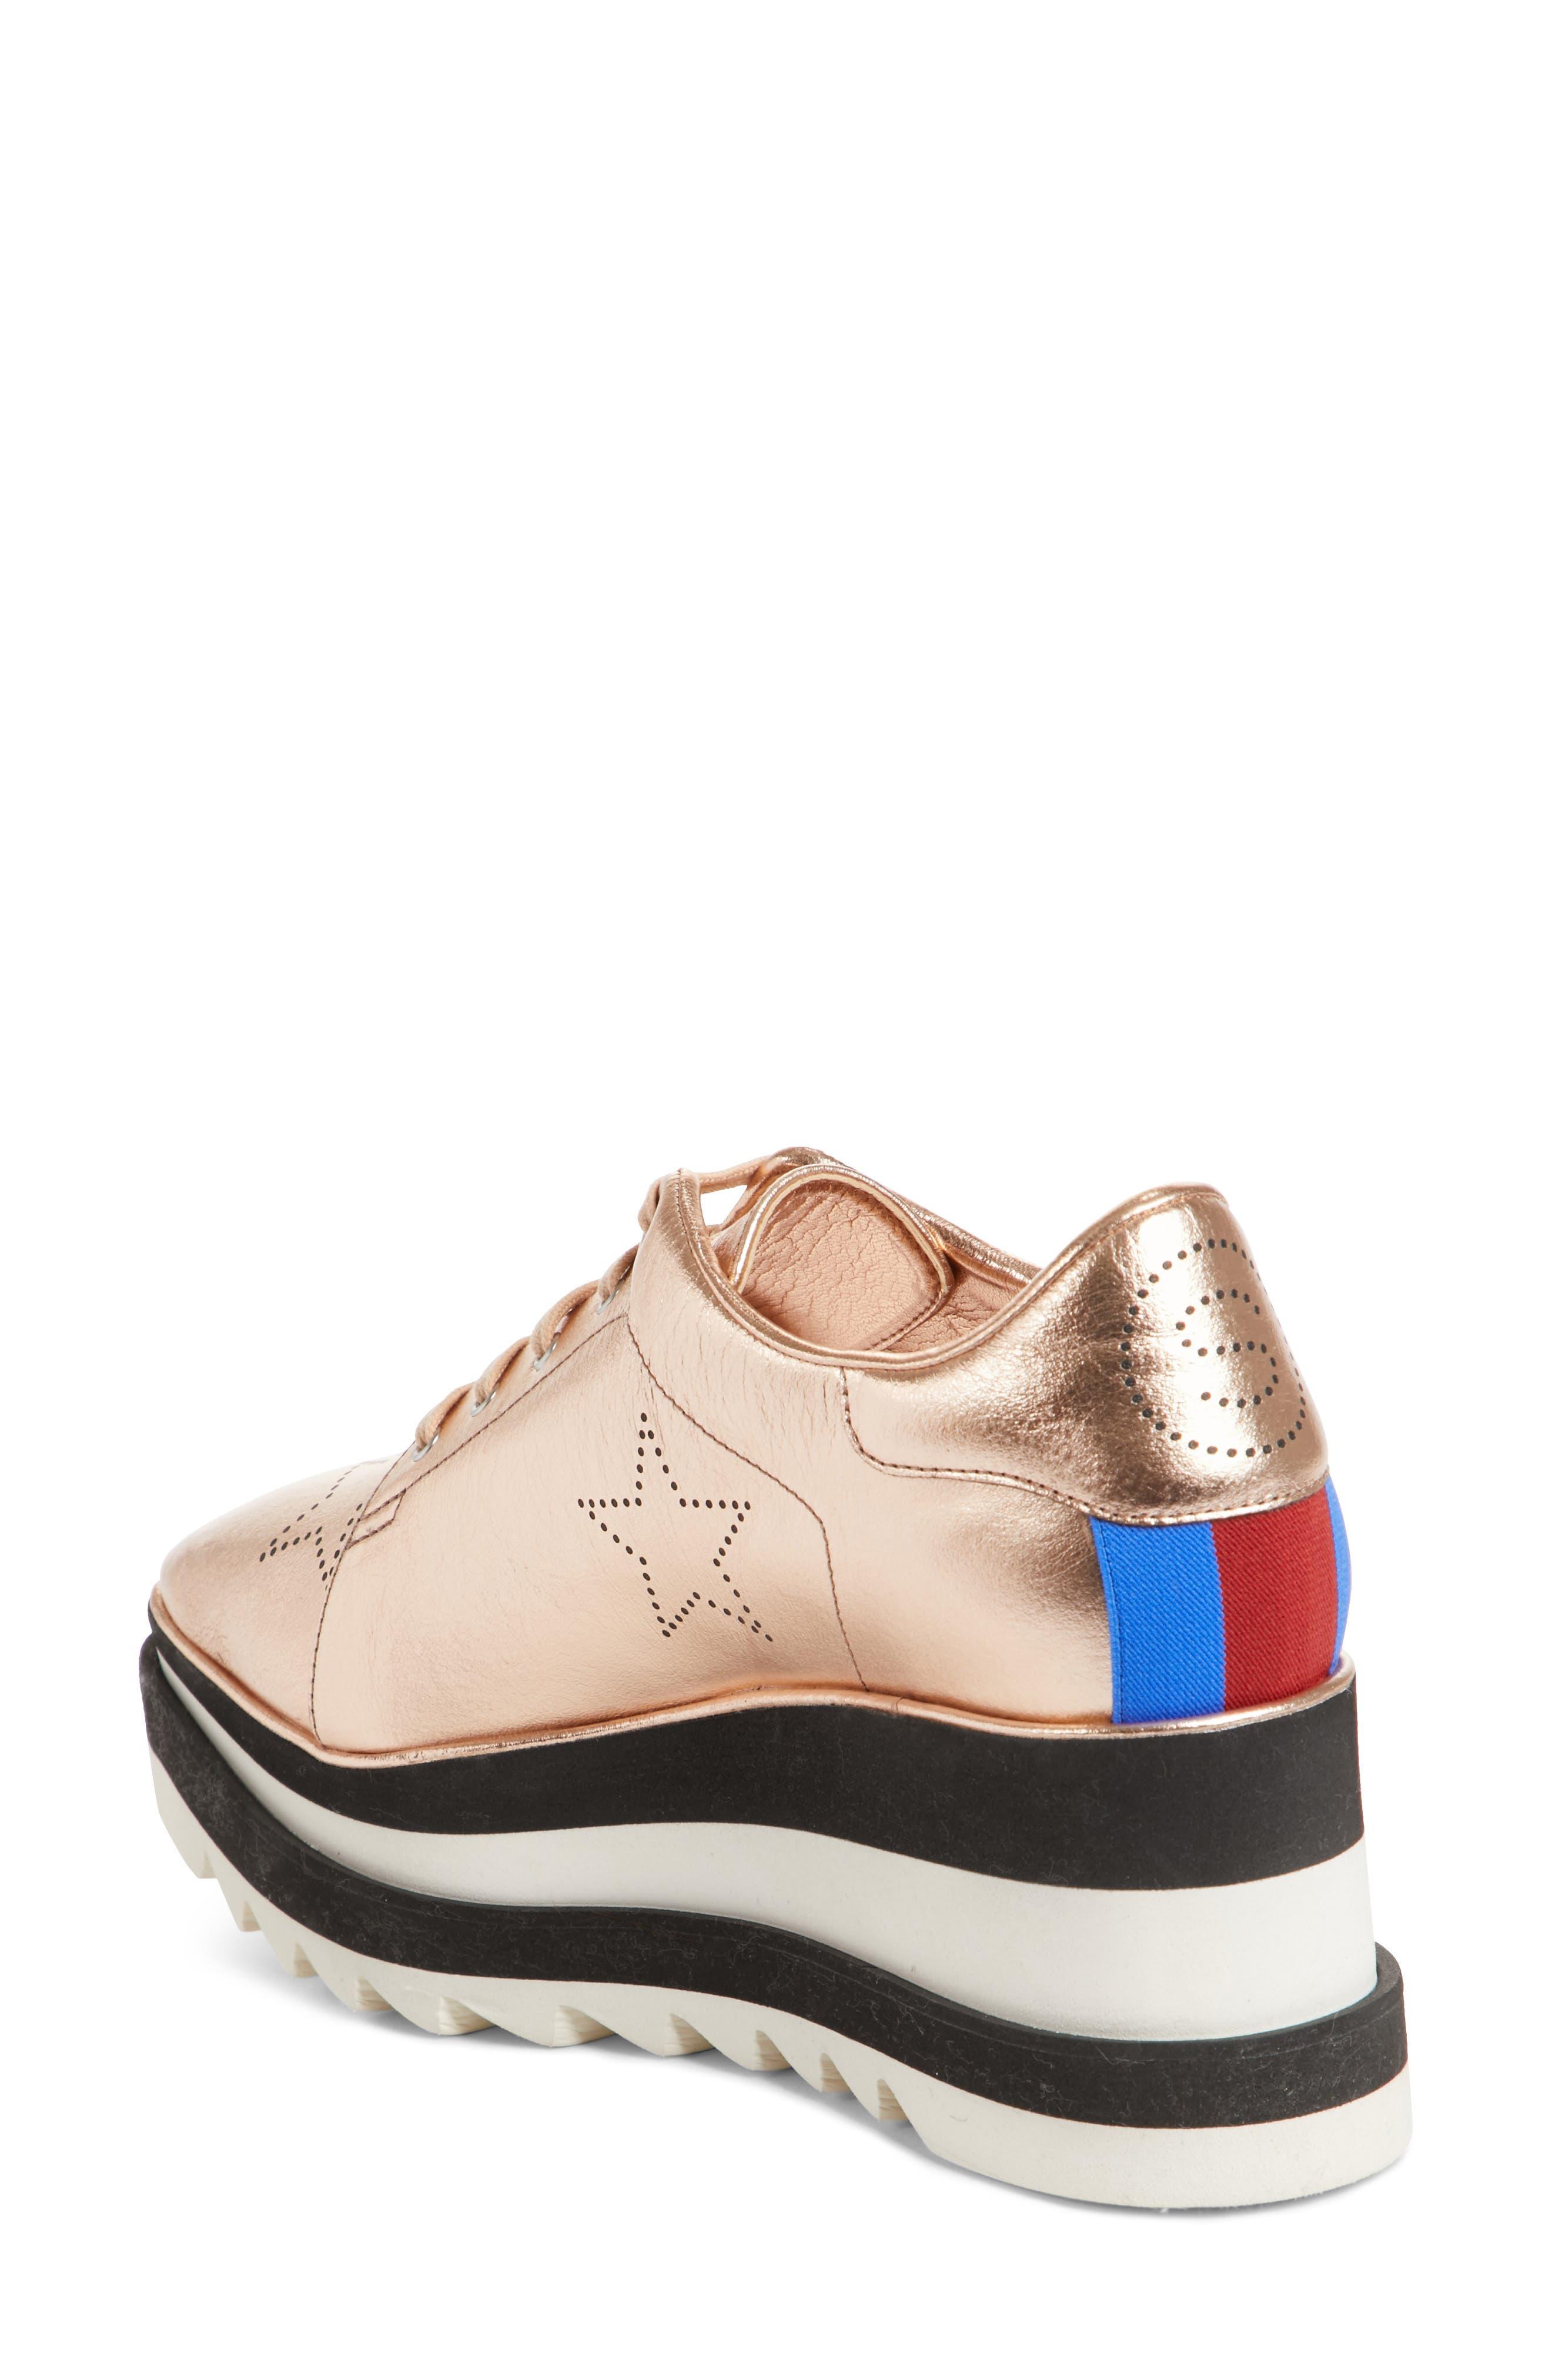 Alternate Image 2  - Stella McCartney Elyse Platform Sneaker (Women)